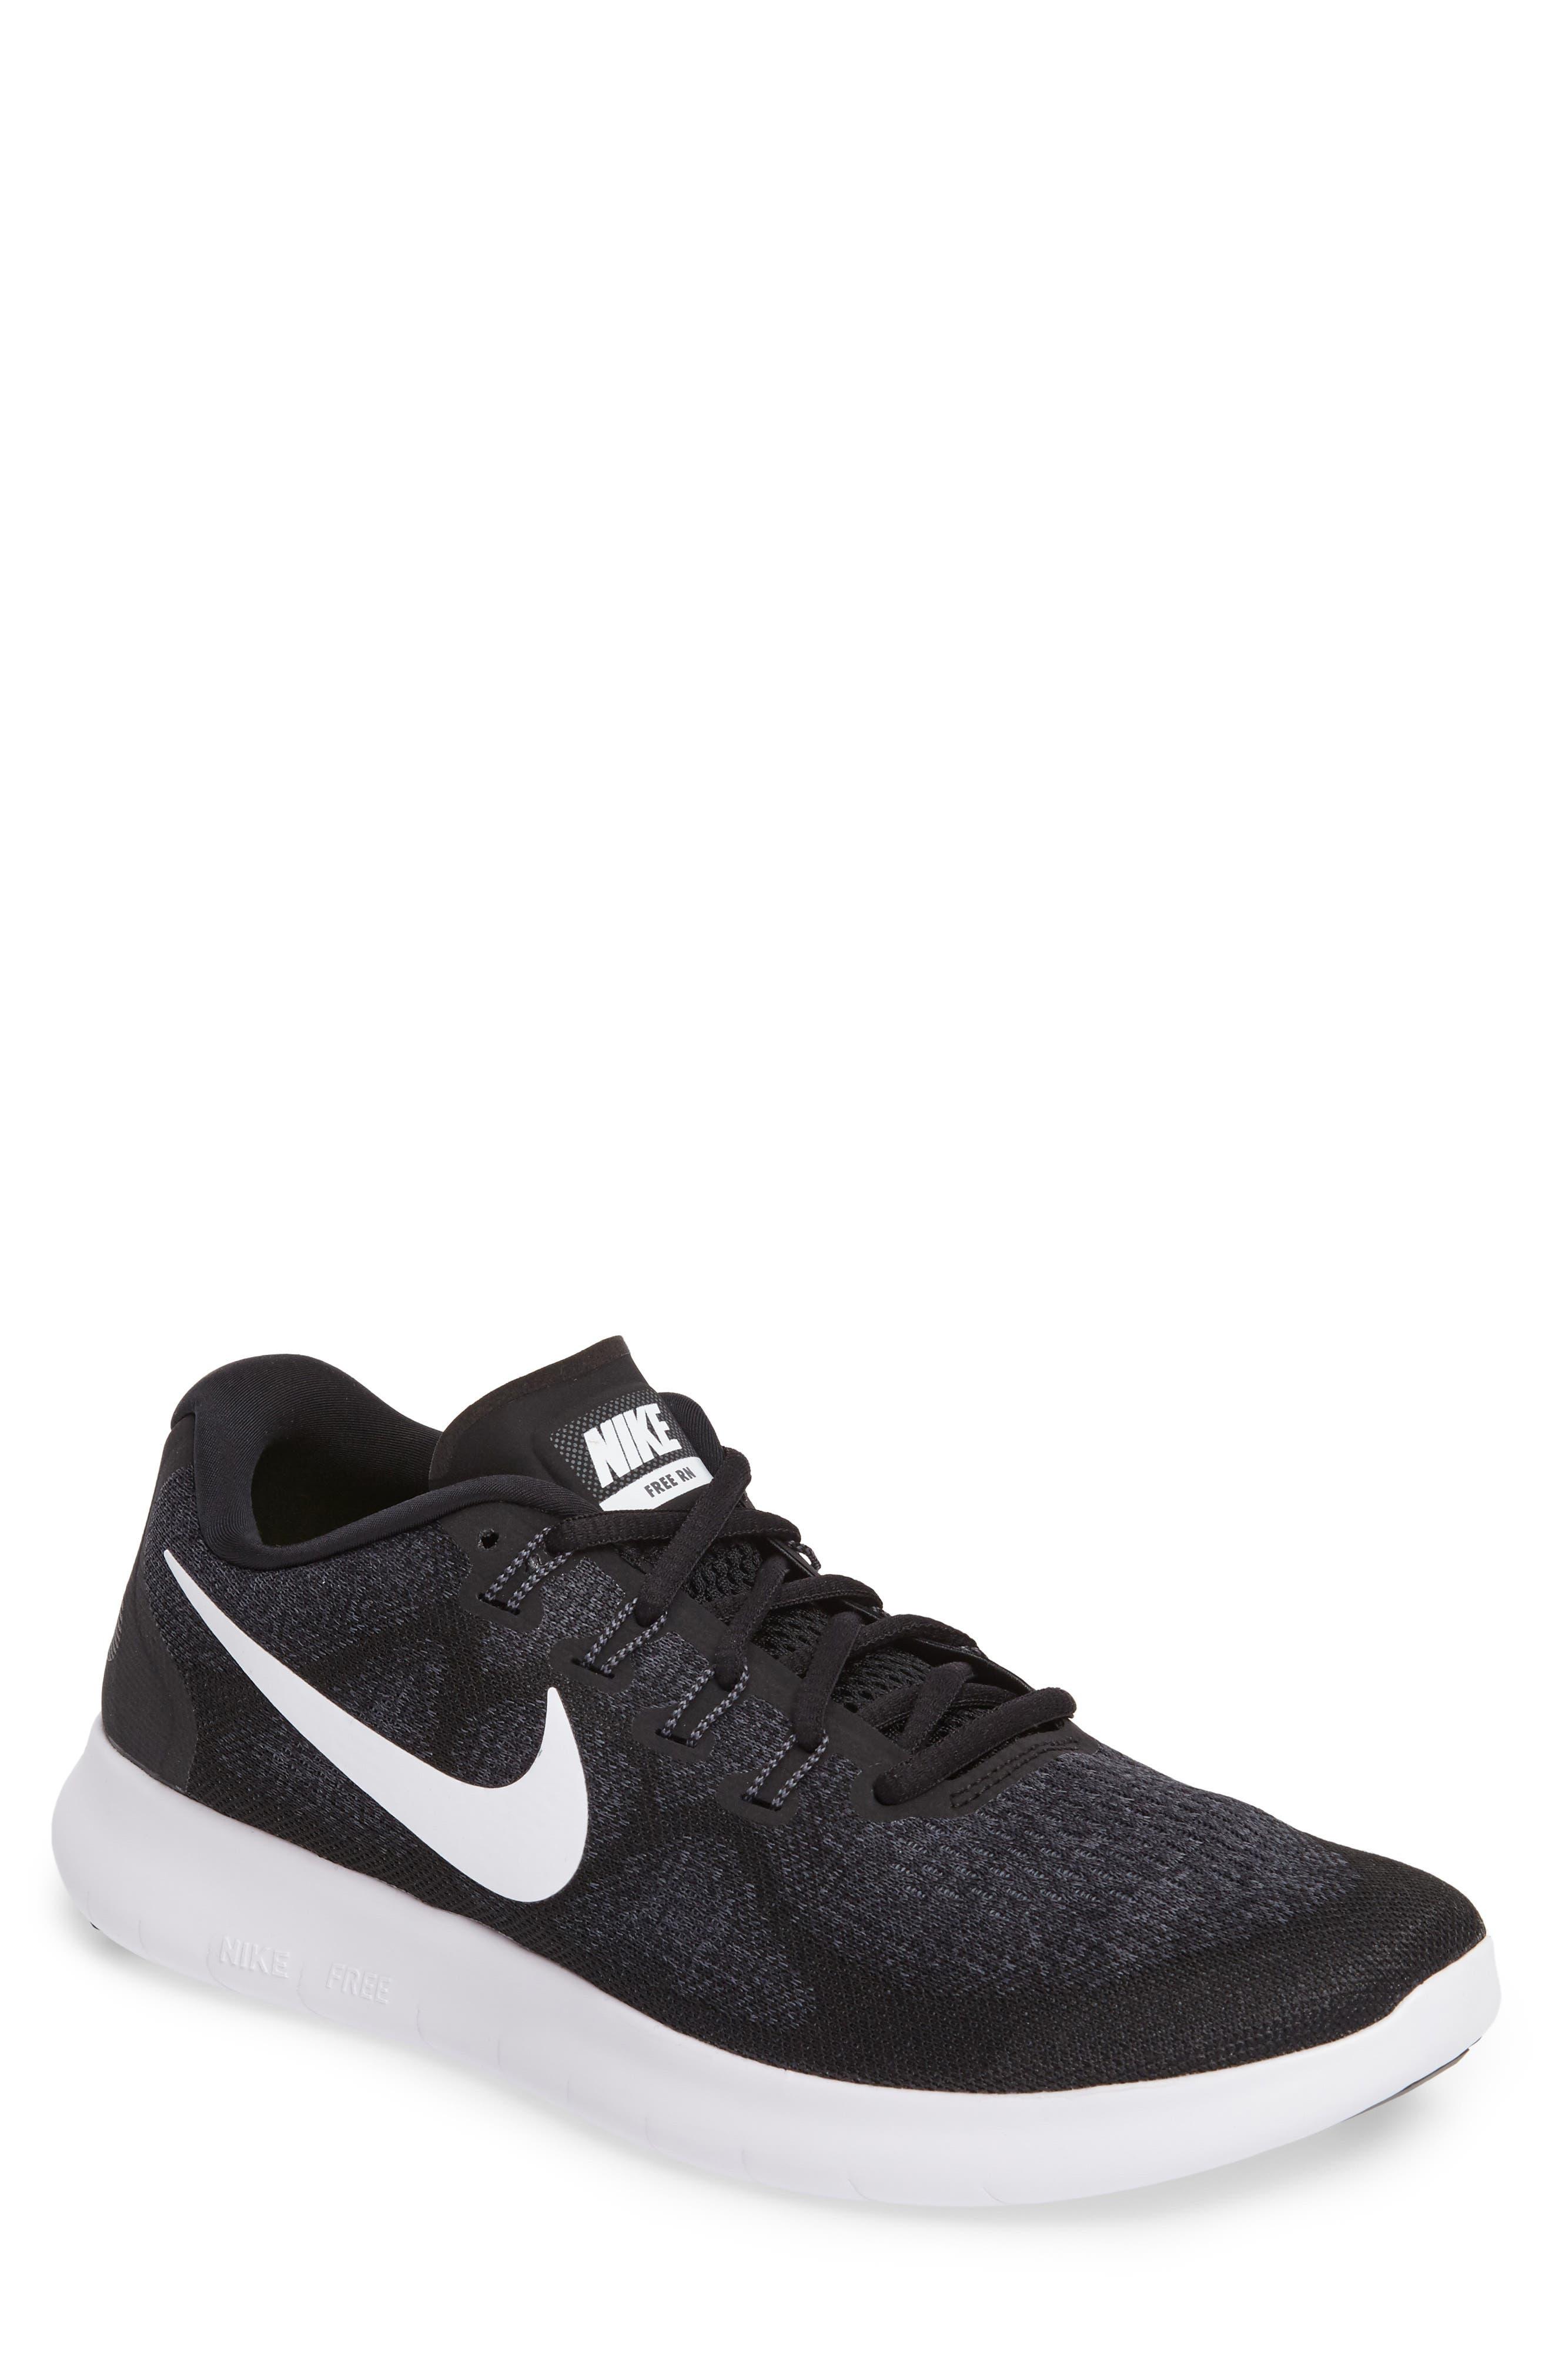 Free Run 2017 Running Shoe,                         Main,                         color, Black/ White/ Grey/ Anthracite